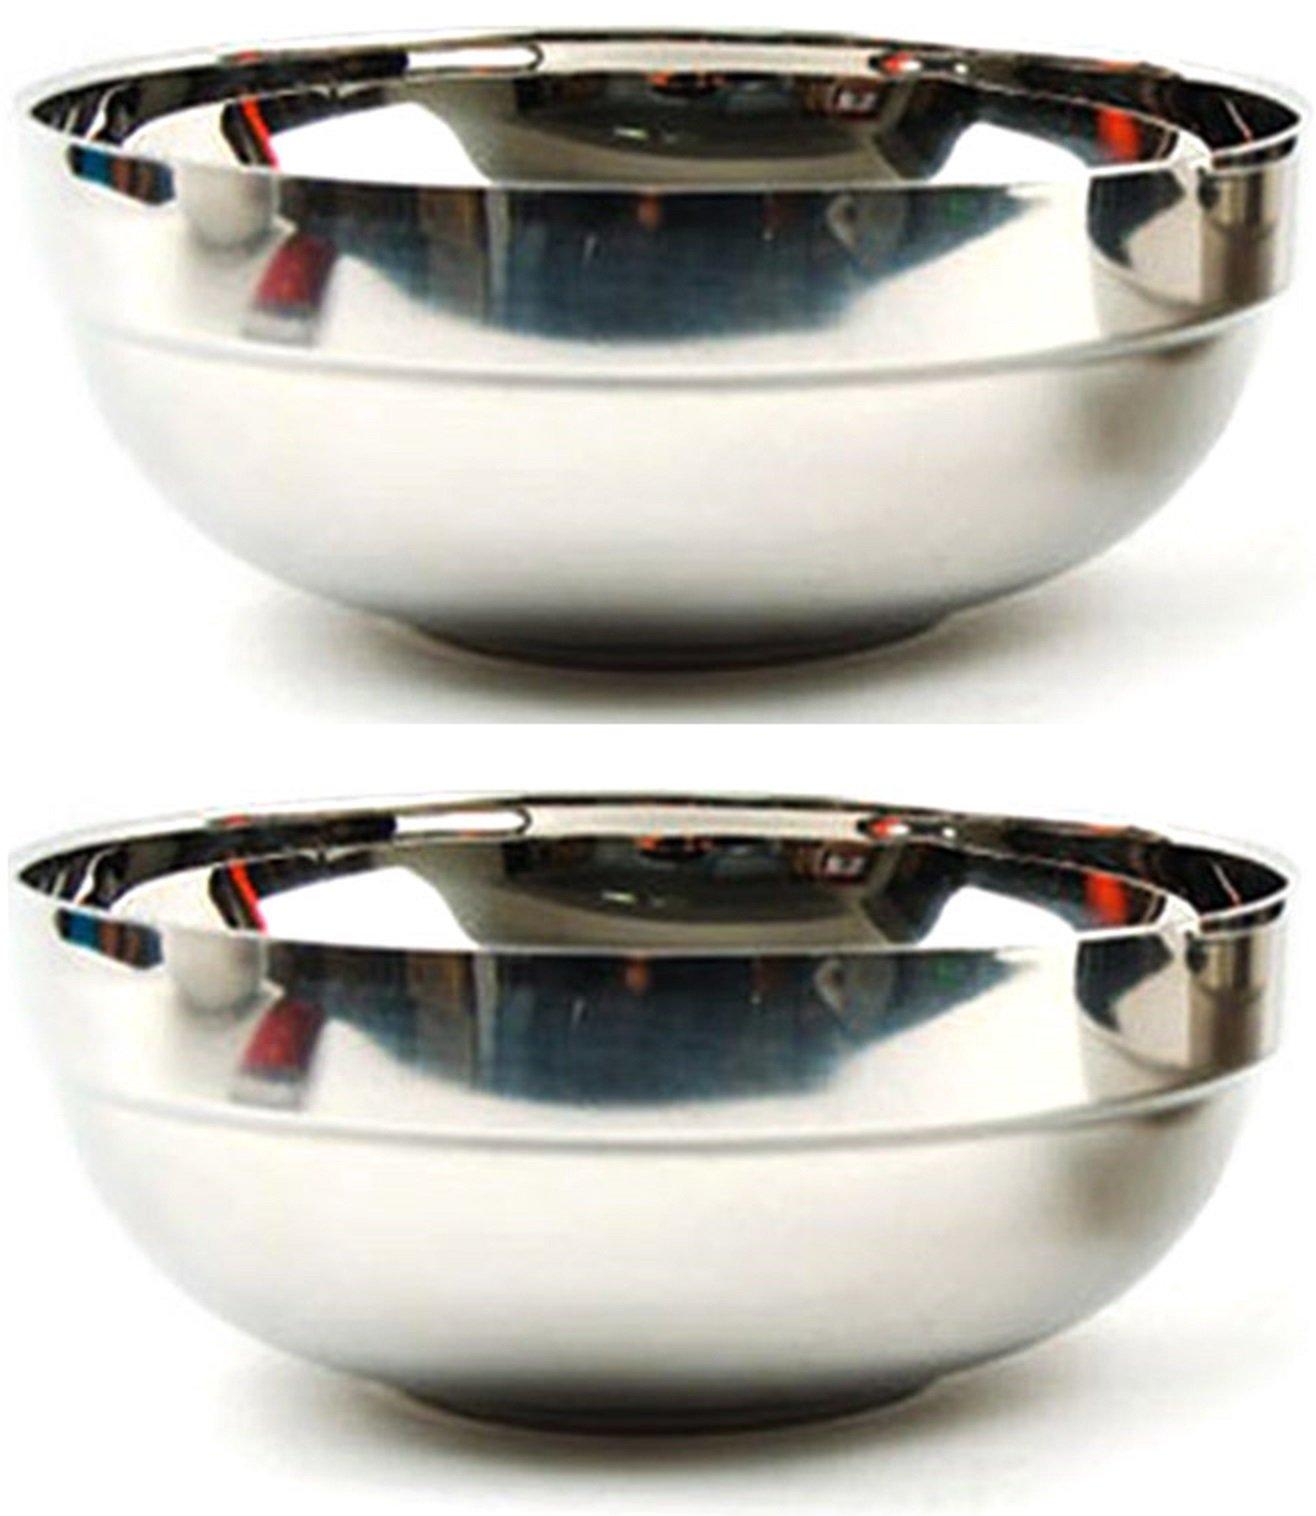 Vacuum Insulated Double Skin Large Size Stainless Steel Korean Traditional Naengmyeon Bibimbap Kalguksu Bowl 2 pcs 23 x 8.5cm / 9.1 x 3.4 inches